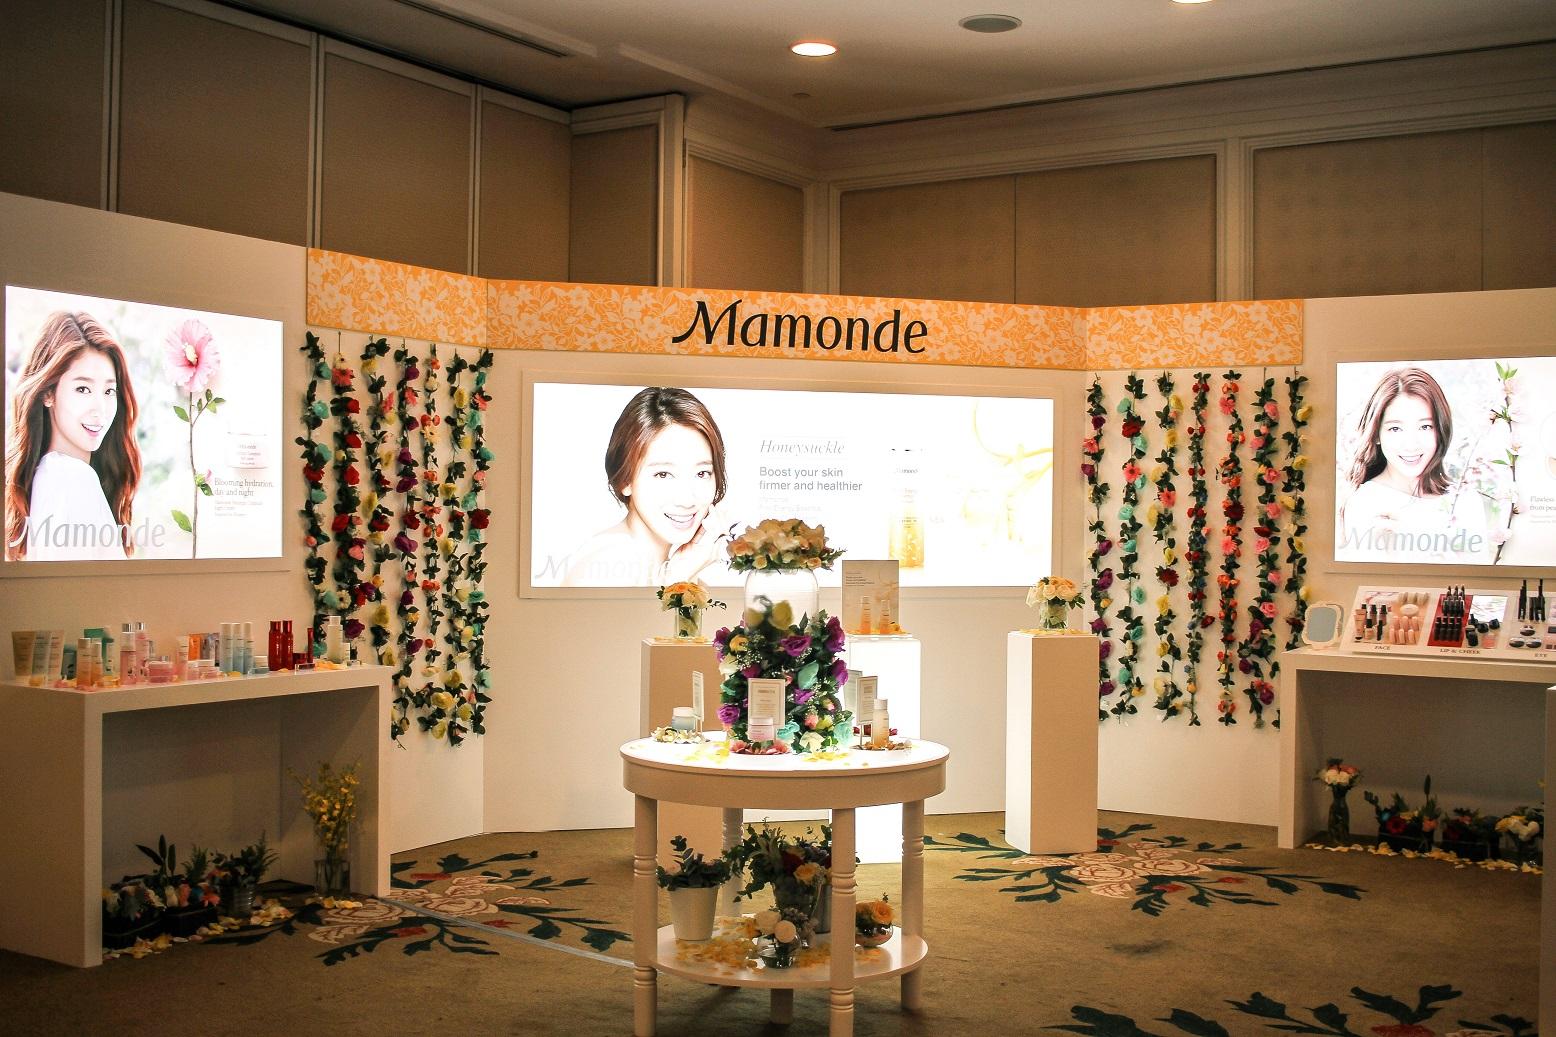 Mamonde Product Experience Area